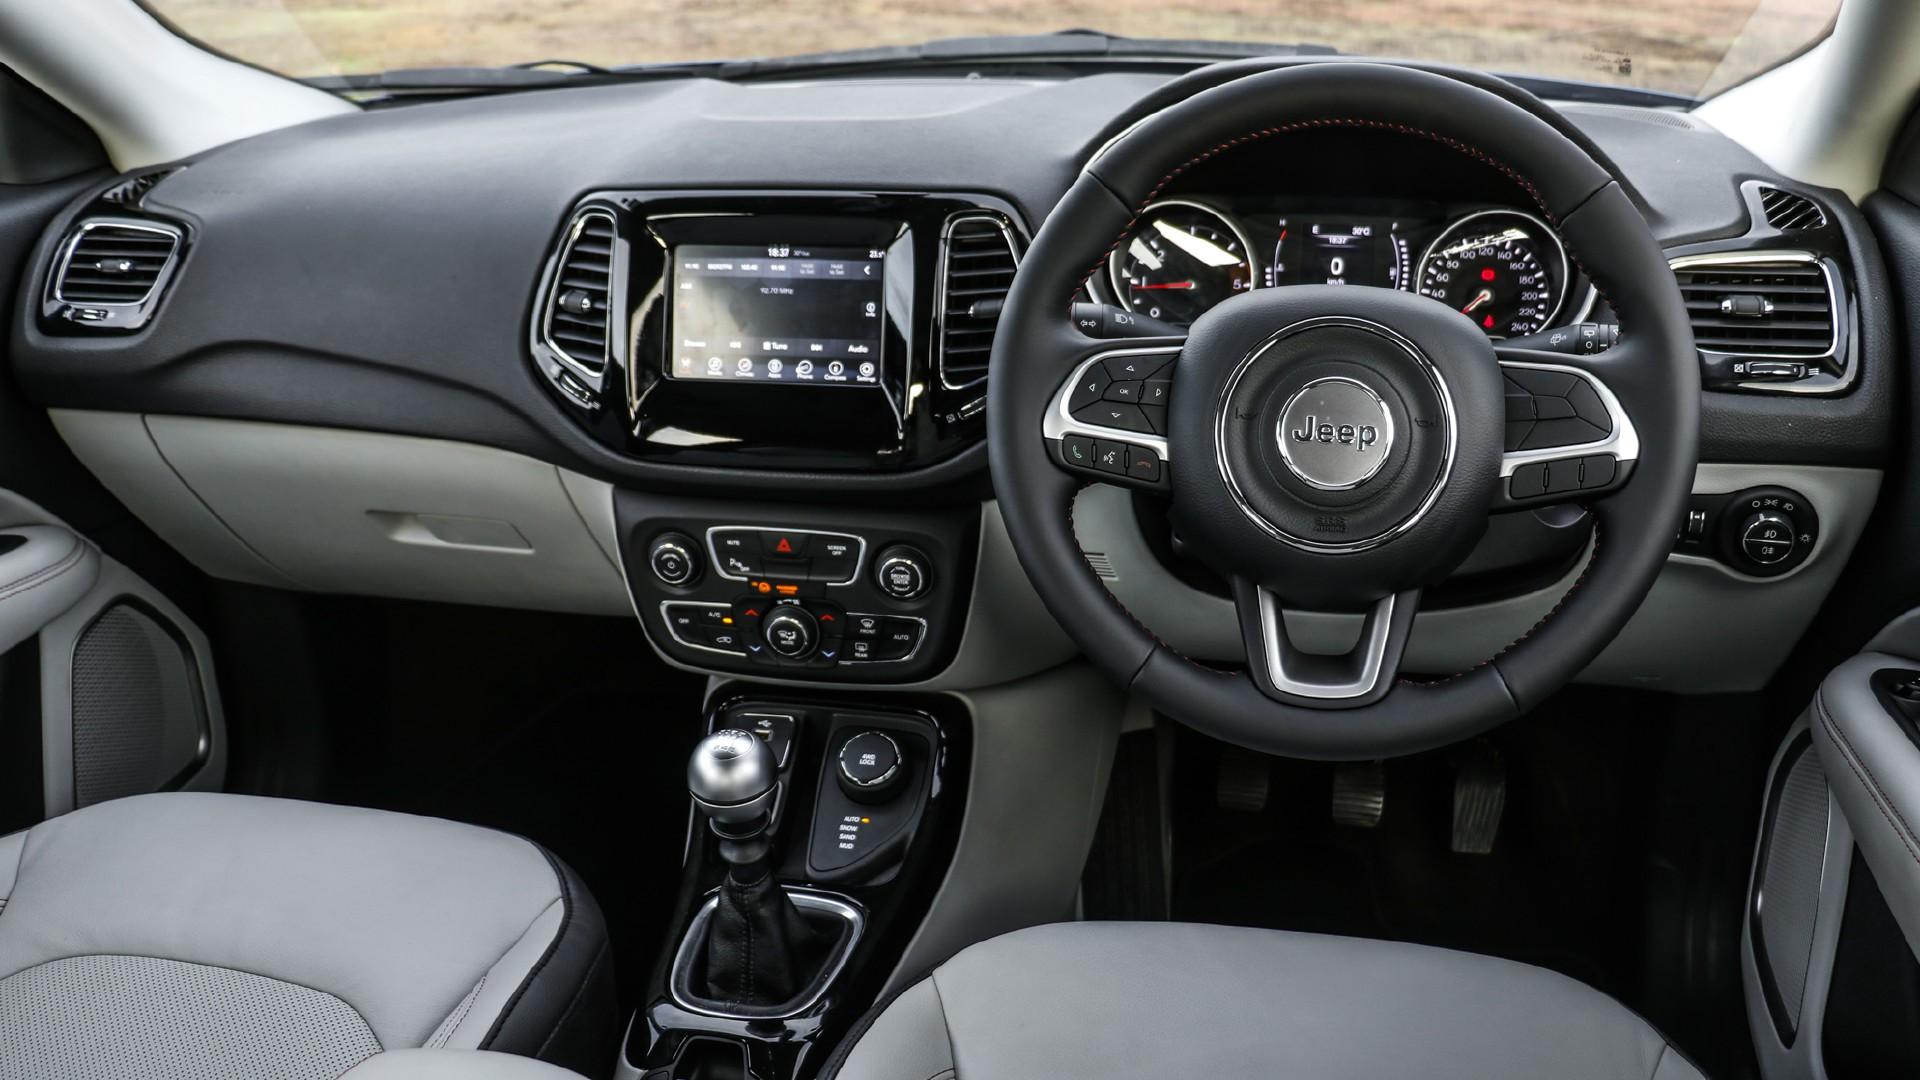 Jeep Compass interiors